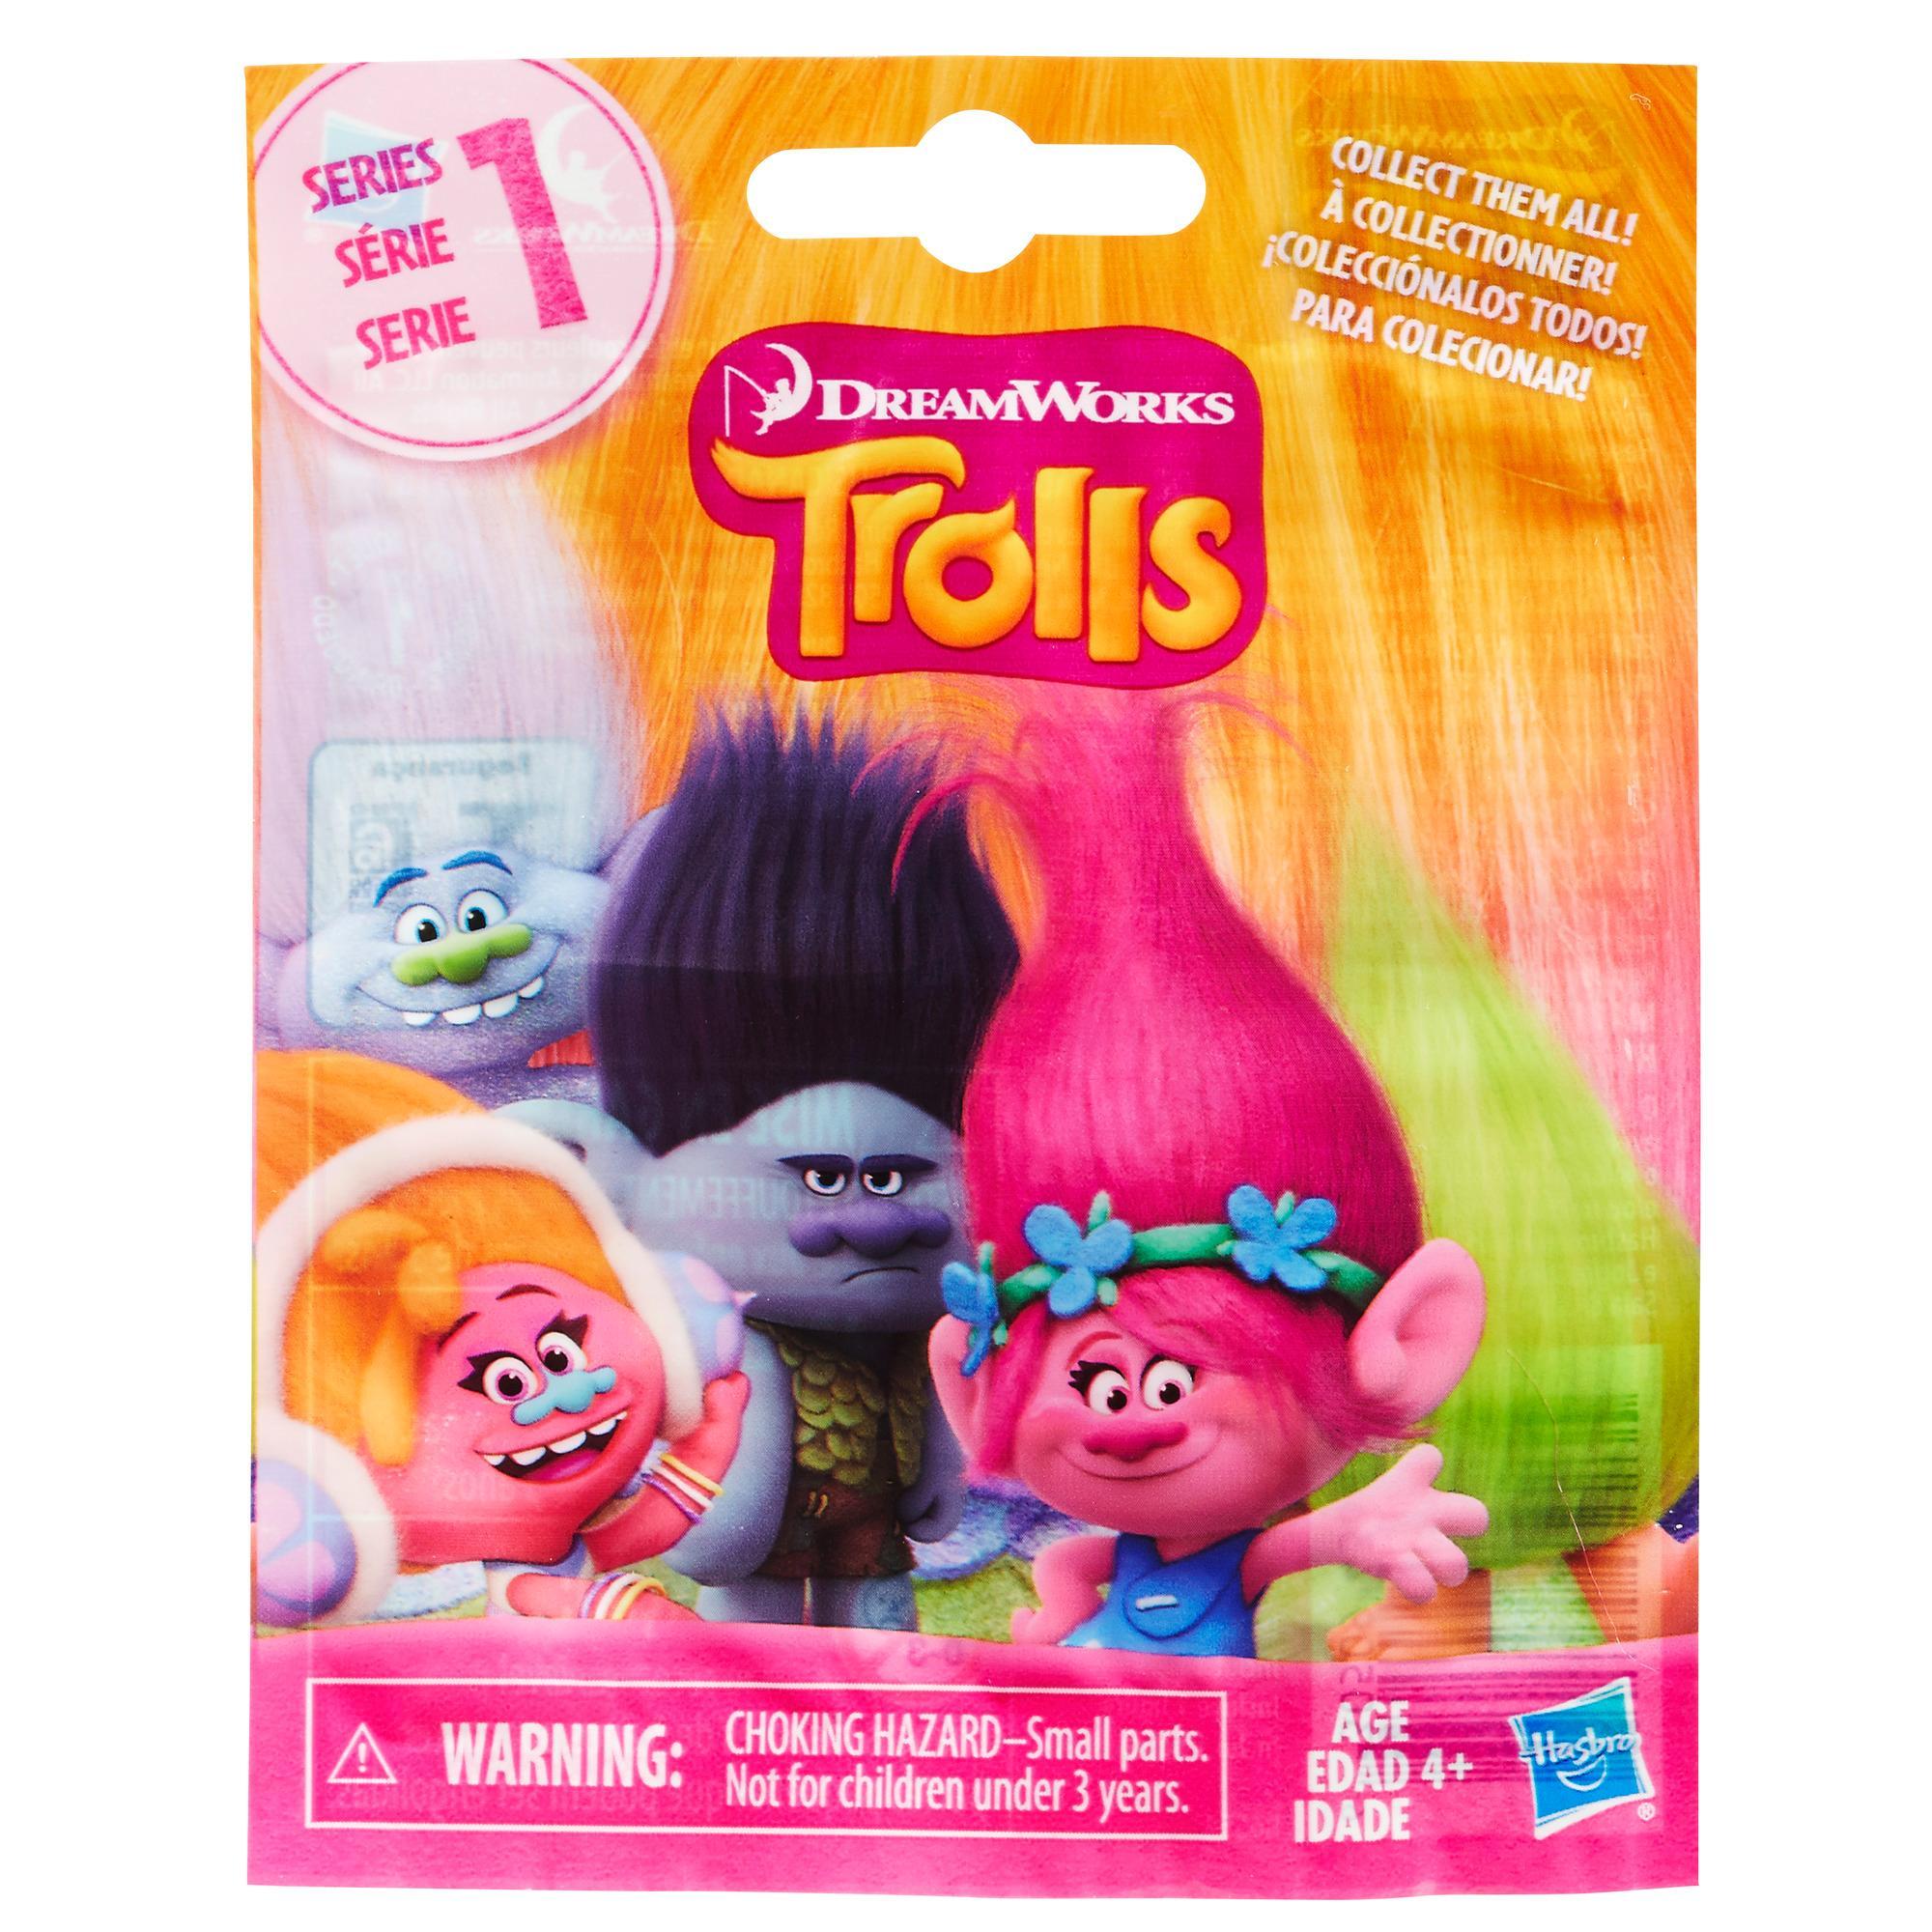 DreamWorks Trolls Surprise Mini Figure Series 1